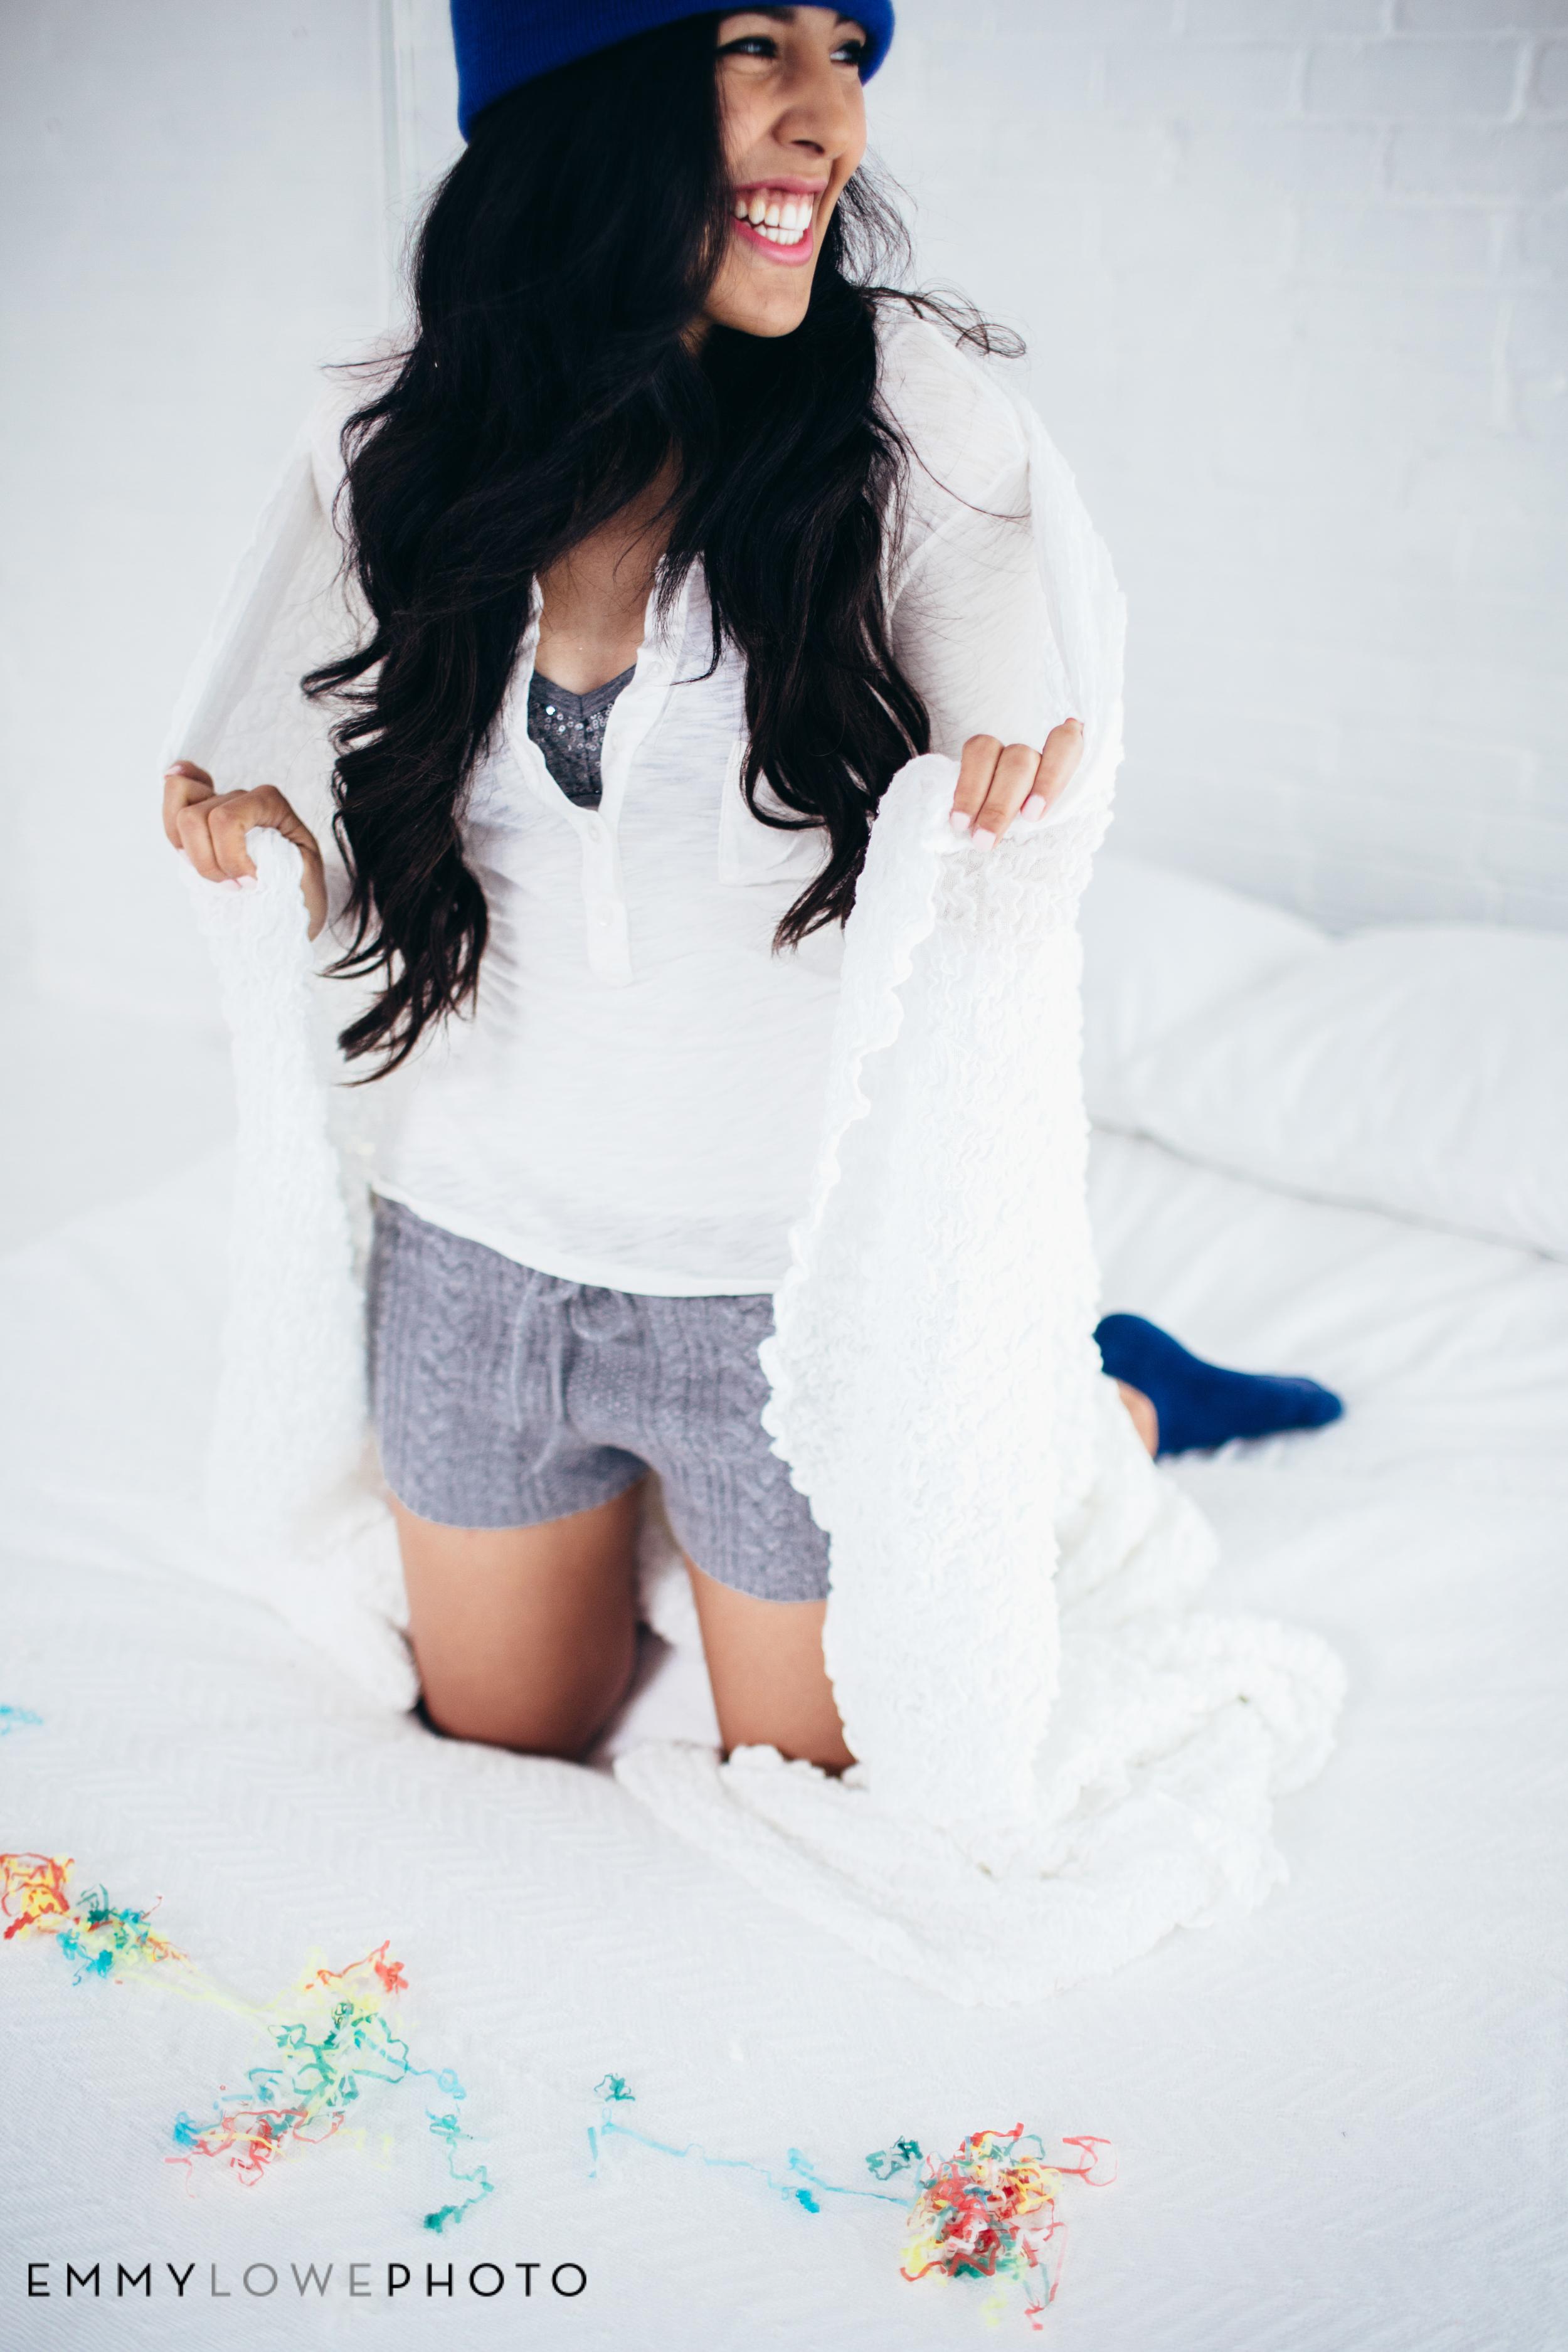 Emmy Lowe Photo | Salt Lake City | Commercial Fashion Photographer